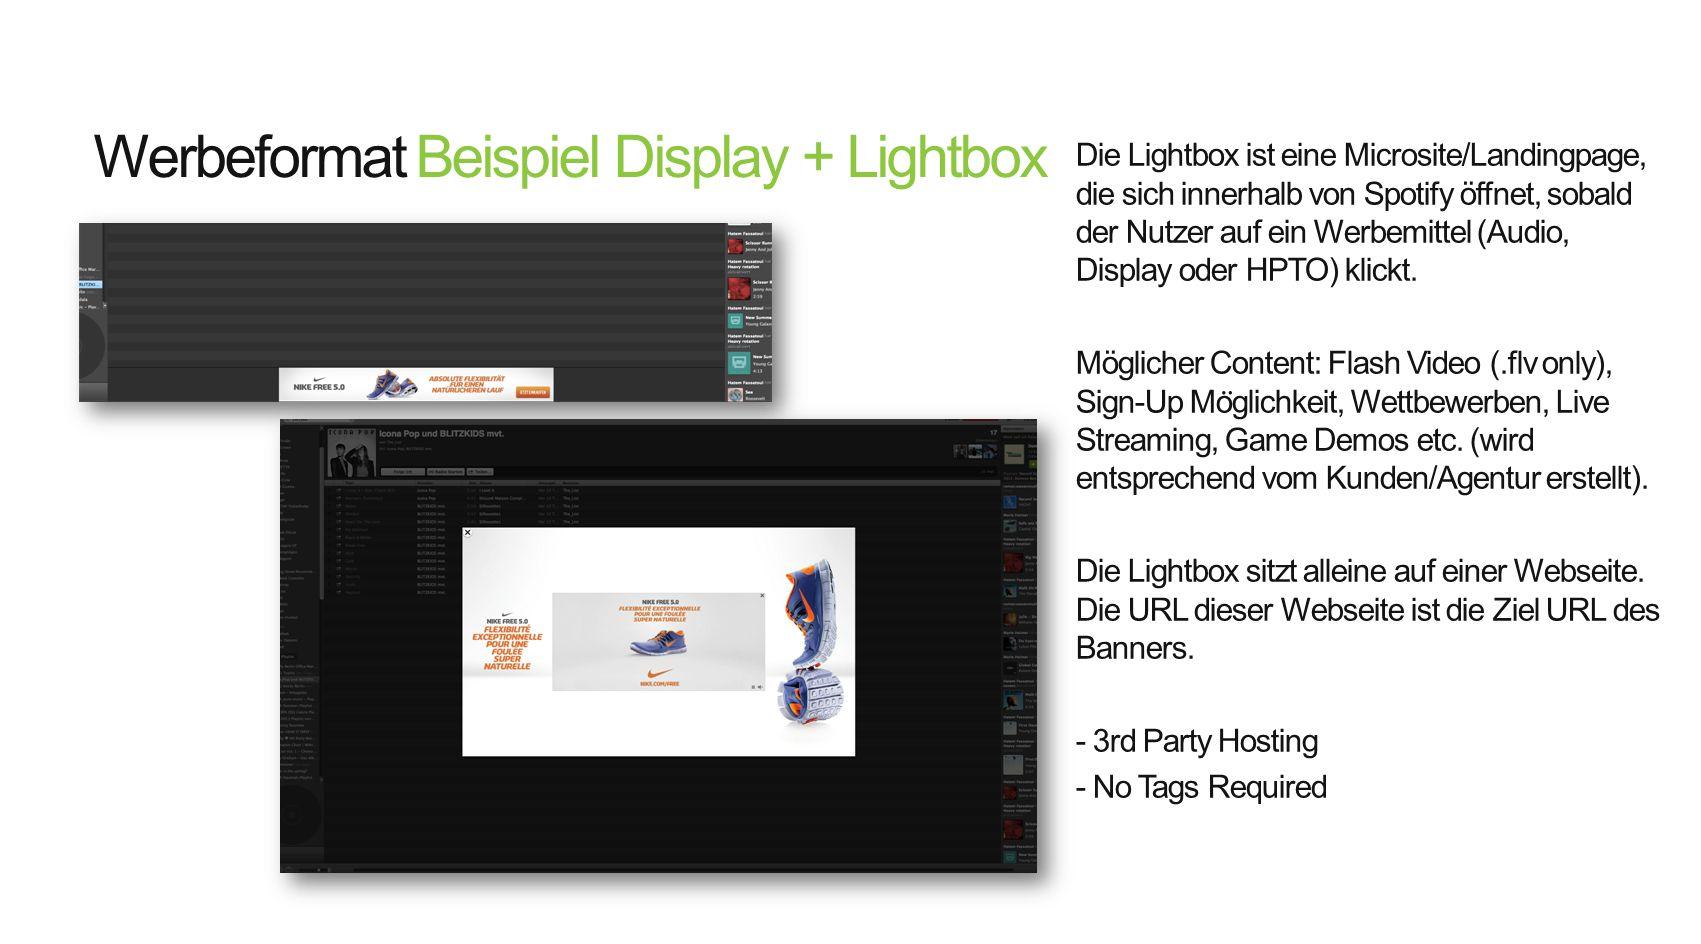 Werbeformat Beispiel Display + Lightbox